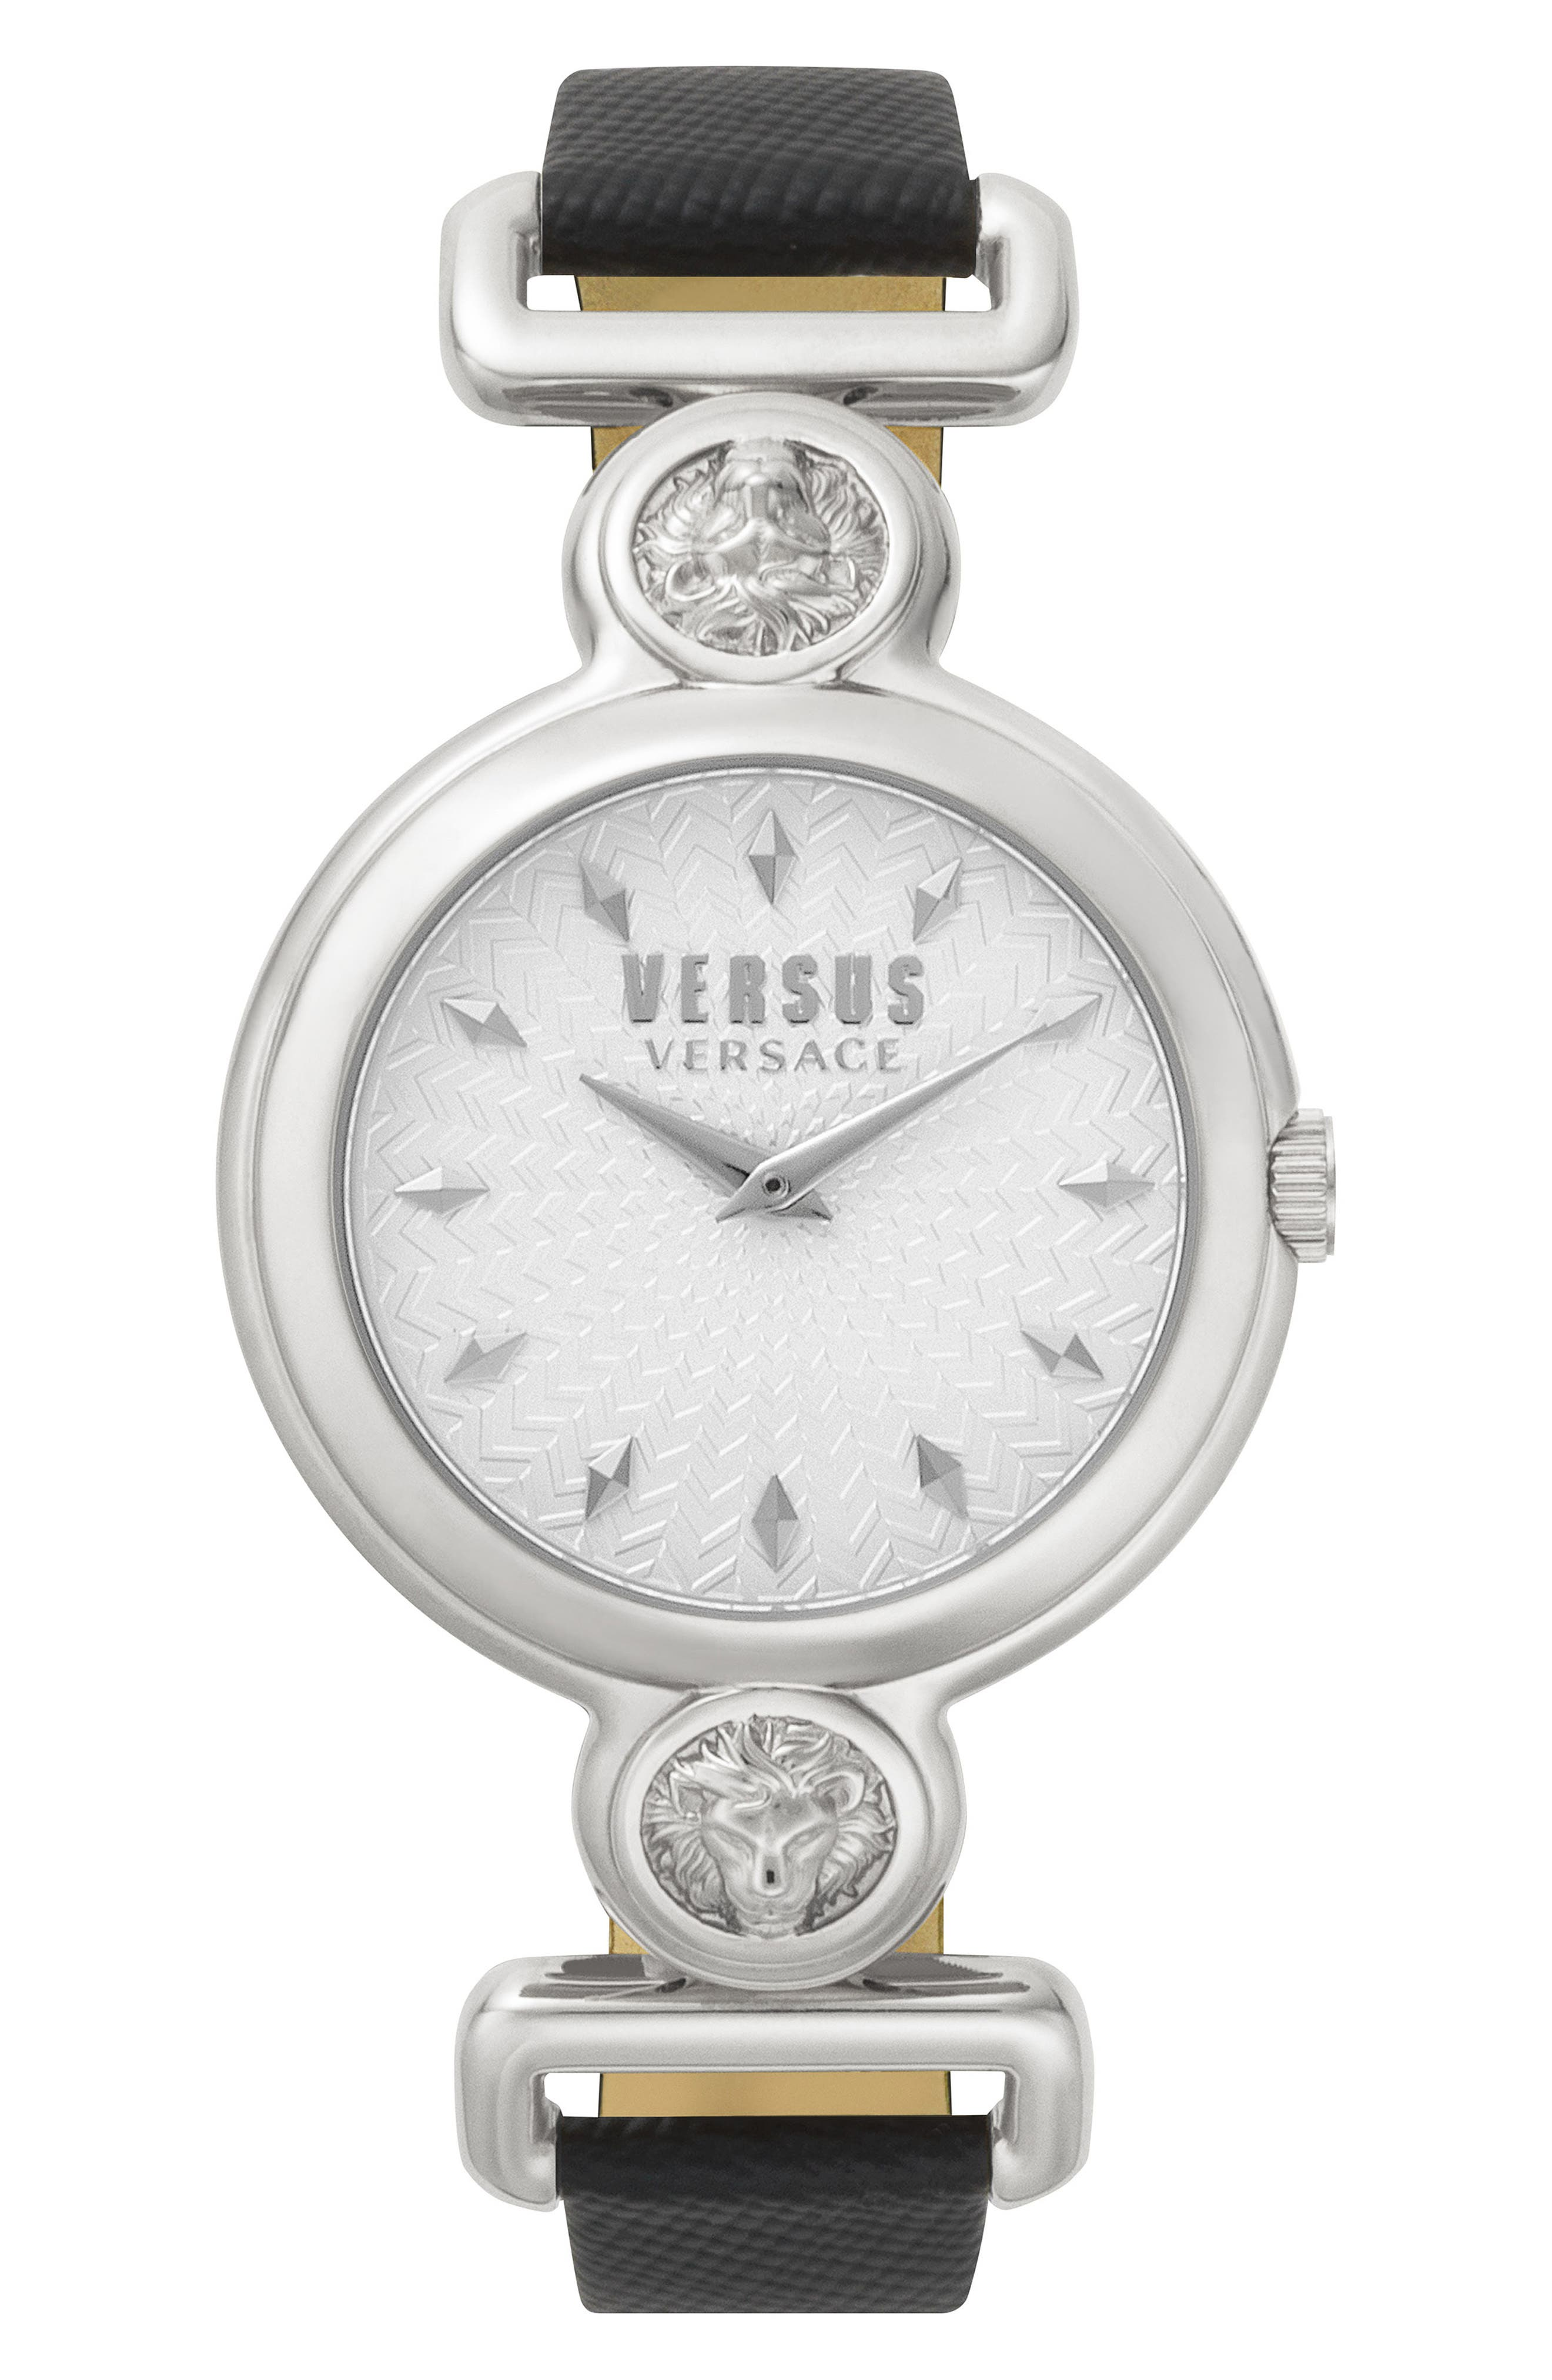 VERSUS VERSACE, Sunnyridge Leather Strap Watch, 34mm, Main thumbnail 1, color, 001